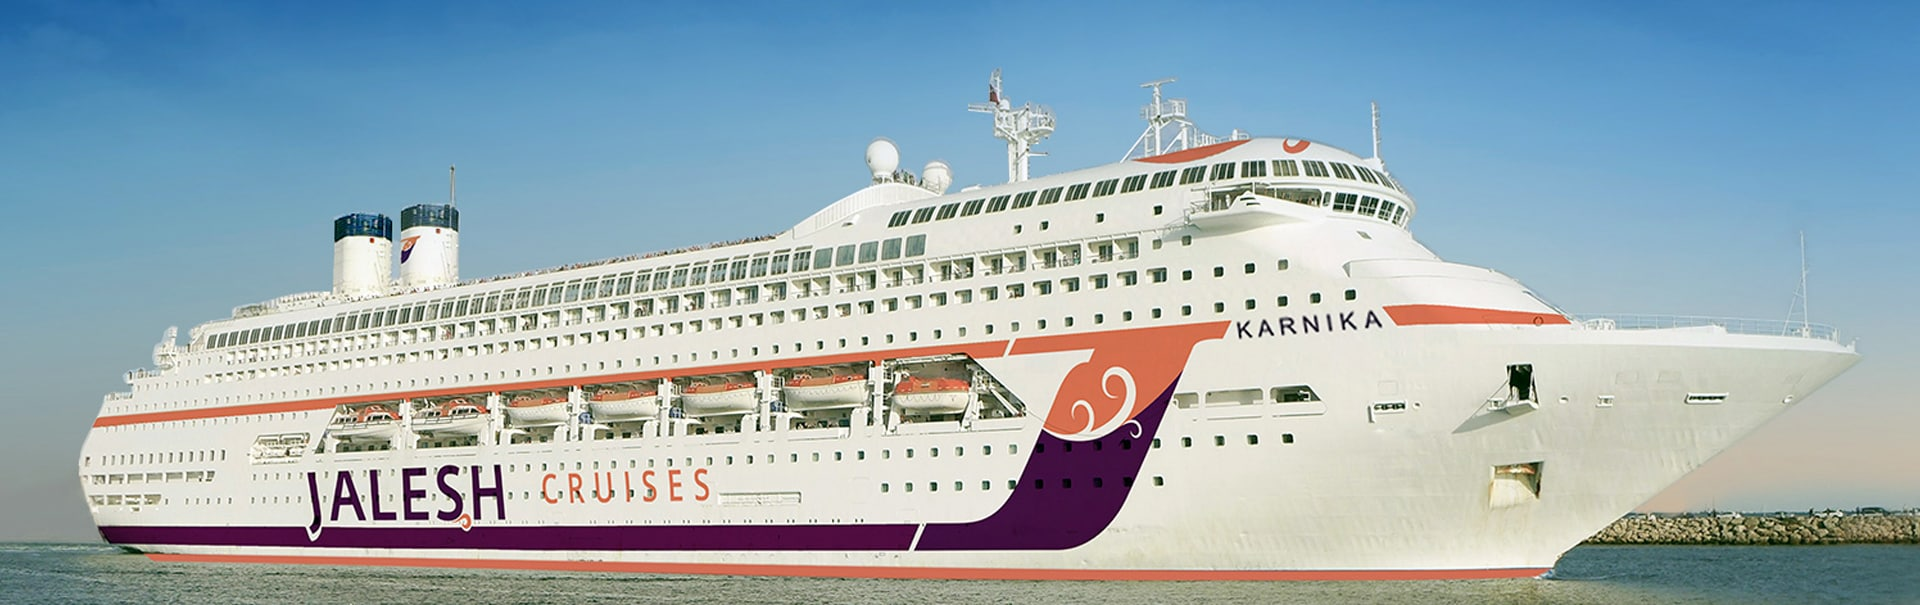 Jalesh Cruise - High Seas (SHMH7) Banner